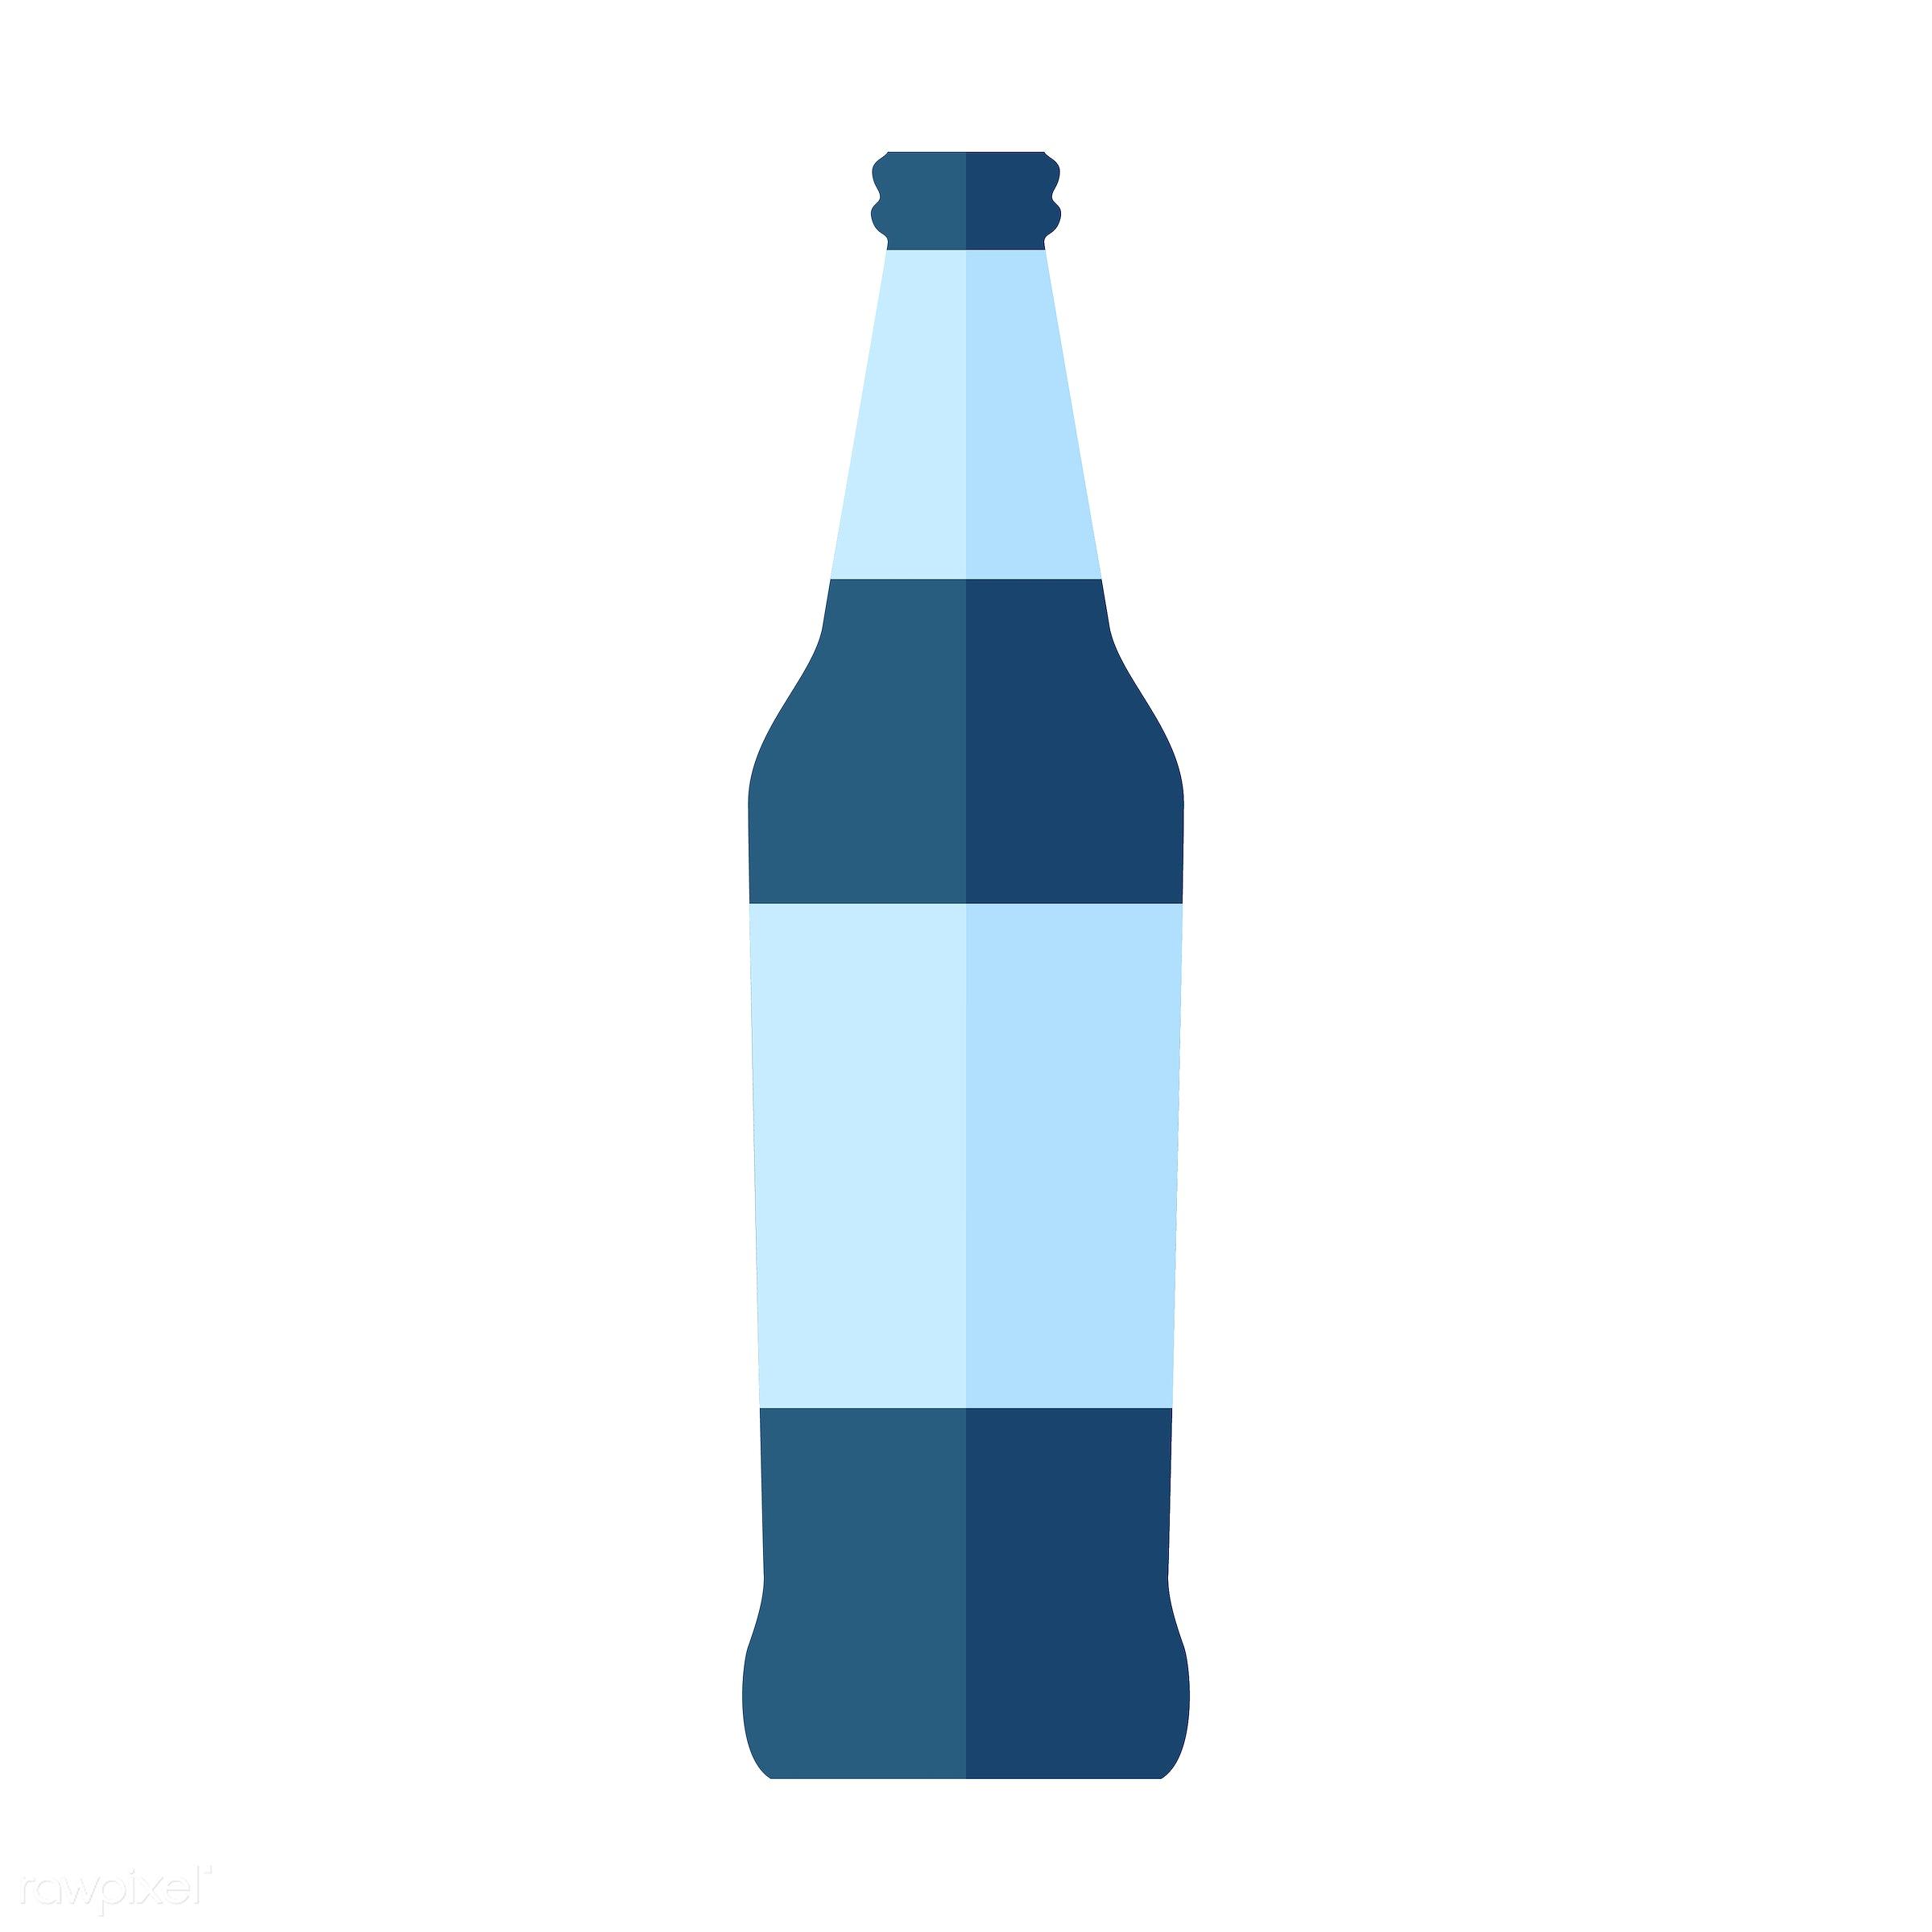 vector, graphic, illustration, icon, symbol, colorful, cute, drink, beverage, water, blue, beer bottle, glass bottle, beer